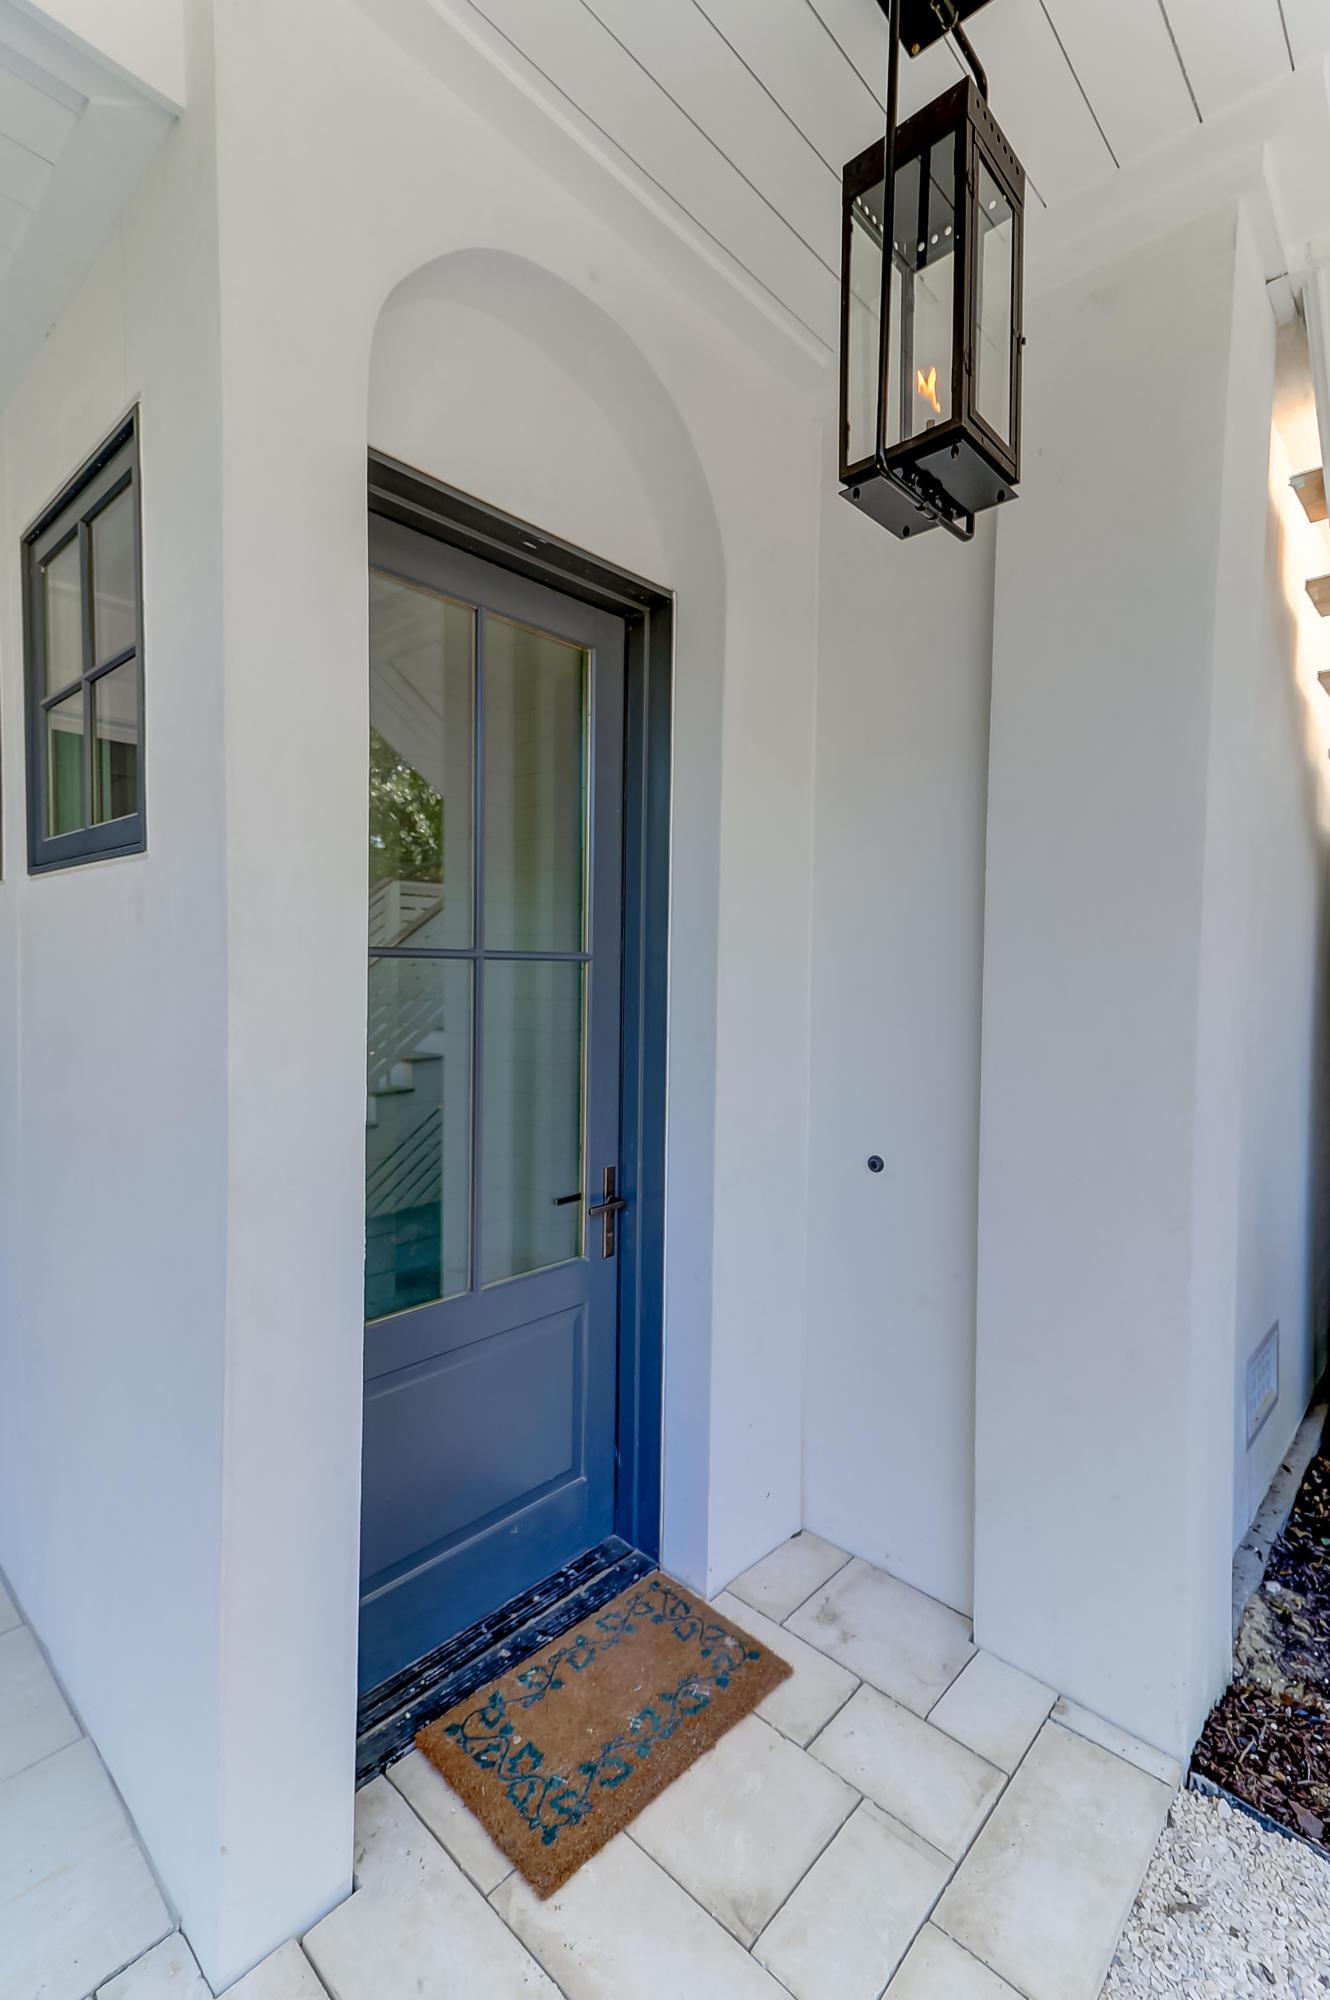 Sullivans Island Homes For Sale - 918 Middle, Sullivans Island, SC - 22